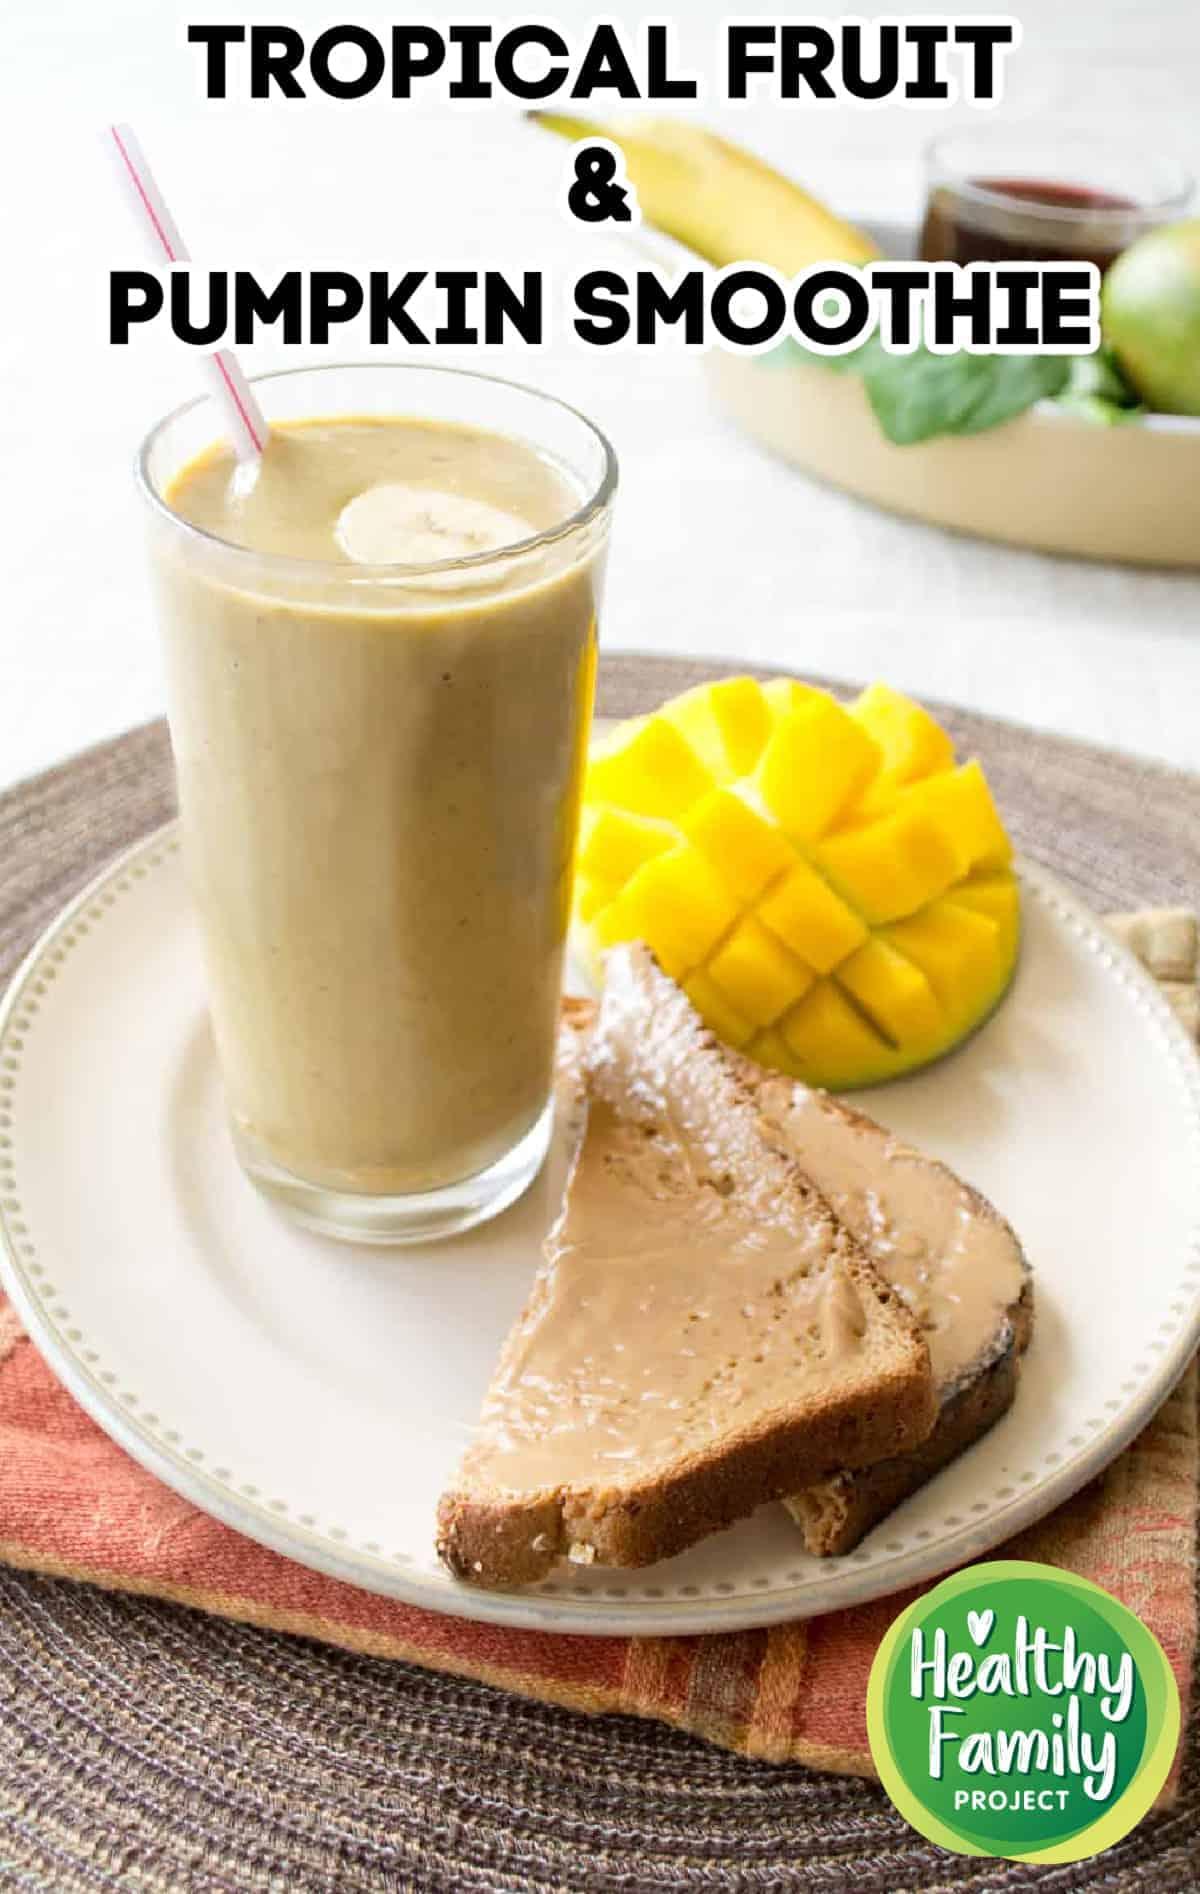 Tasty Tropical Fruit & Pumpkin Smoothie